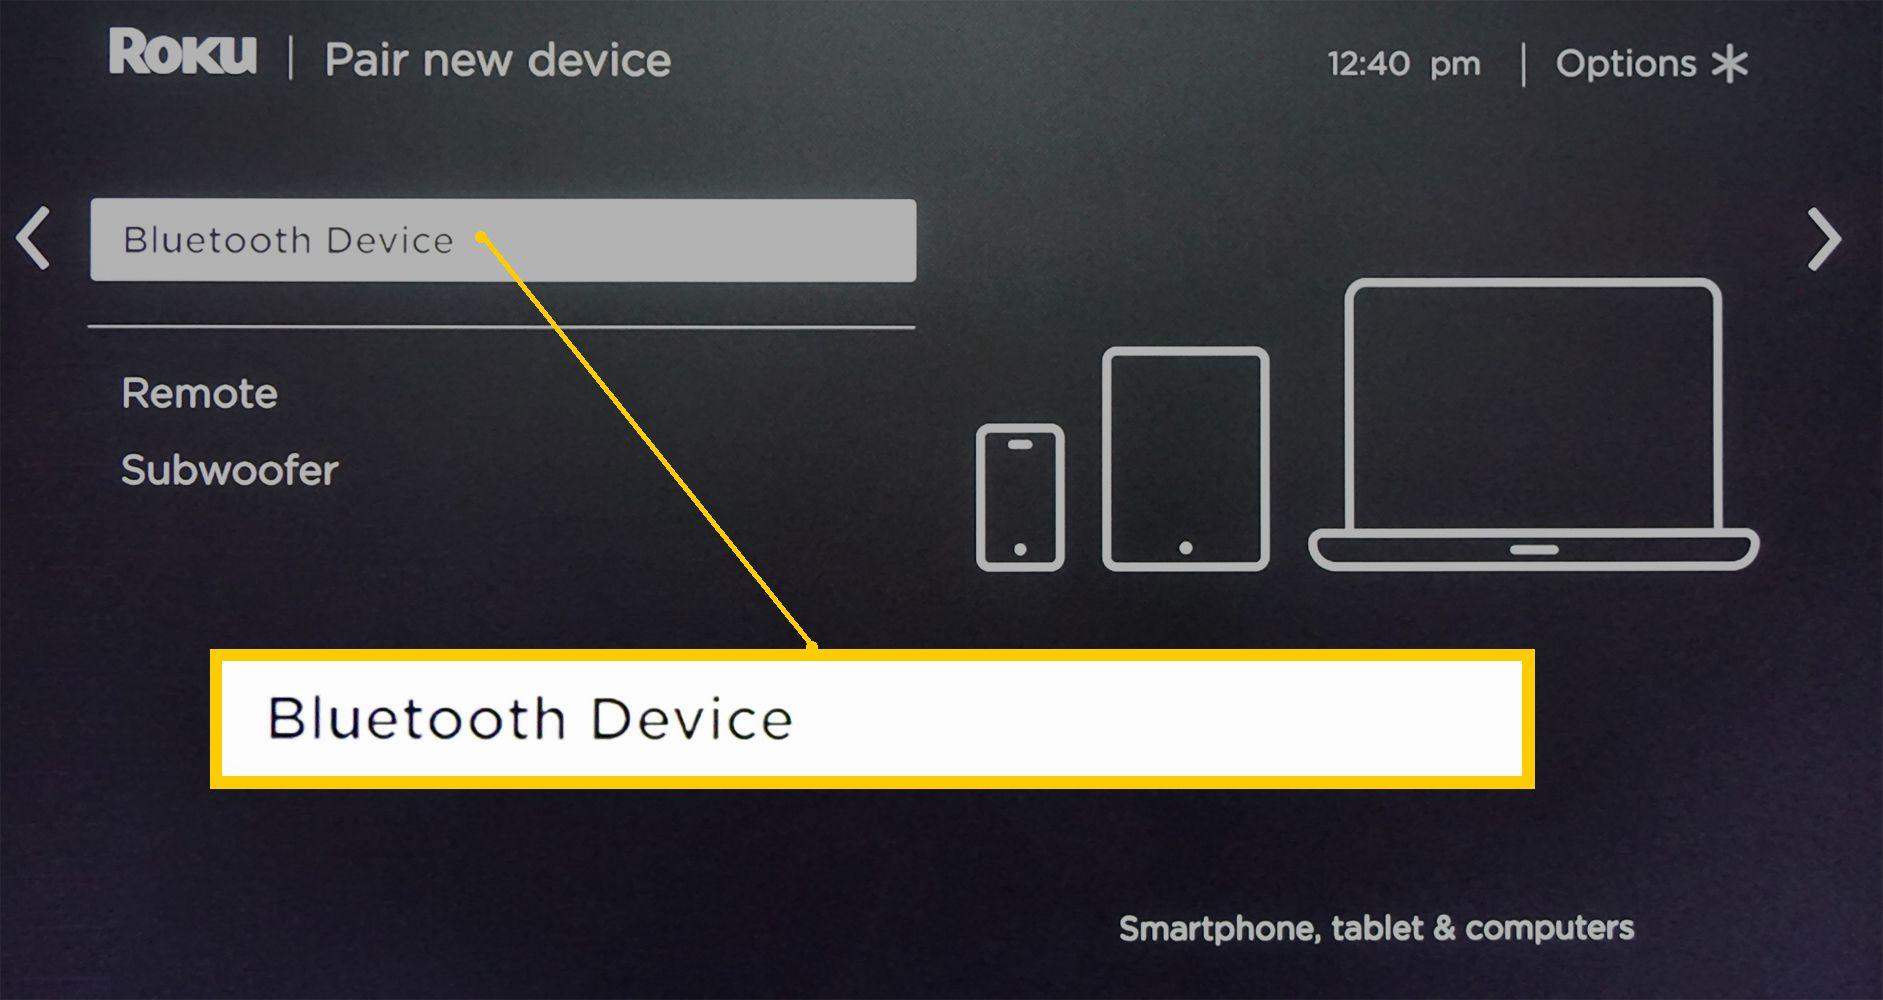 Roku Soundbar – Bluetooth Device Connection Page